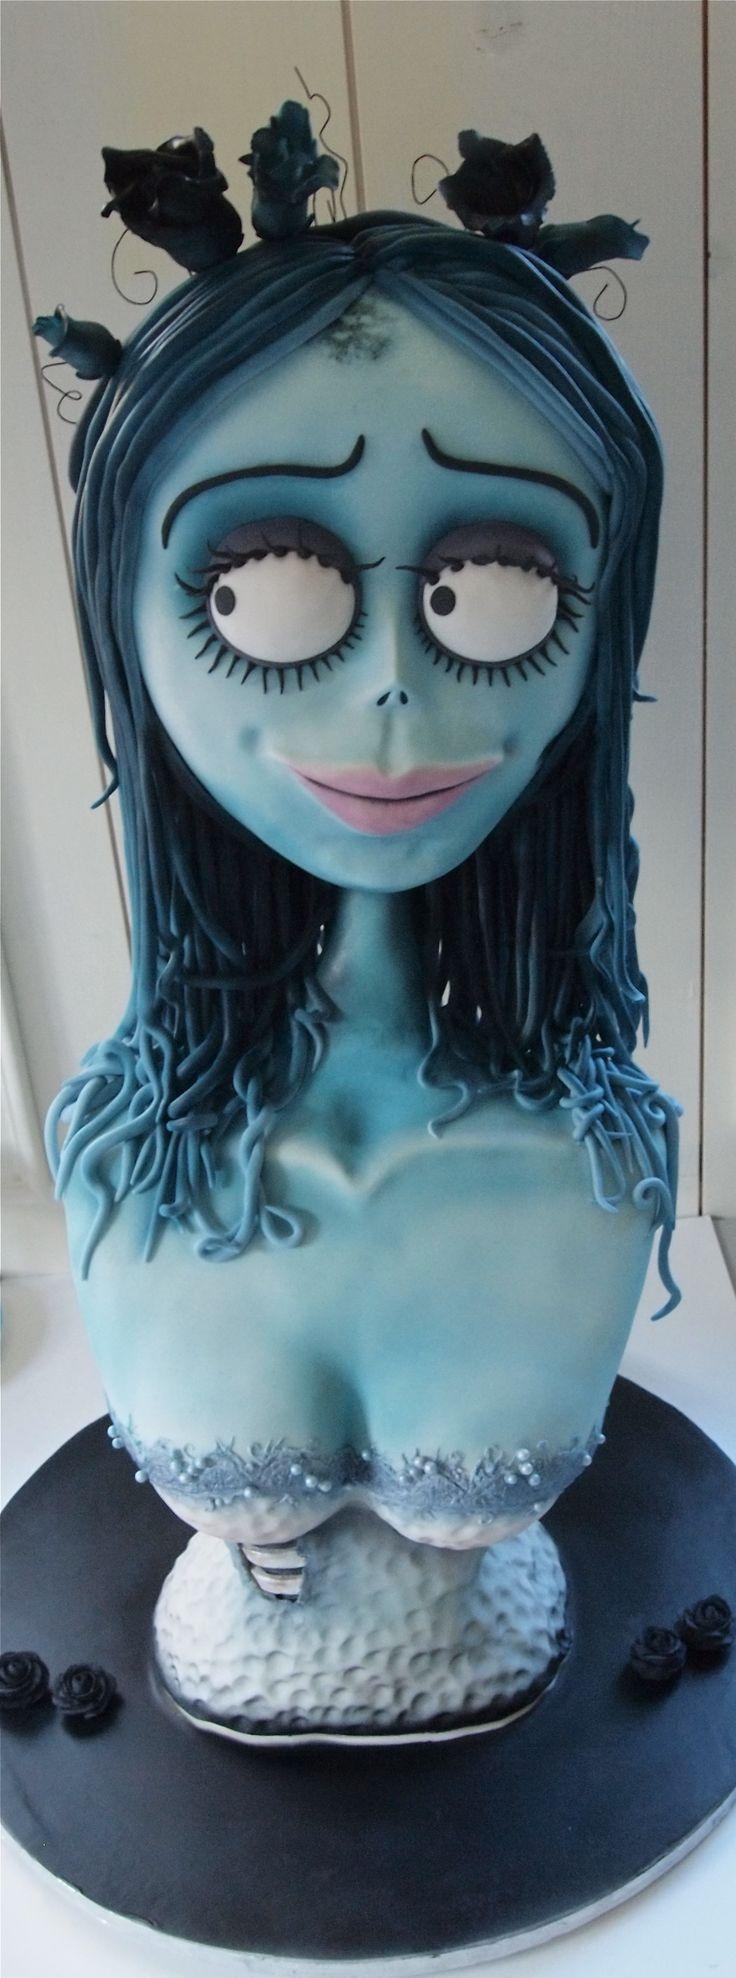 Fantasy/Gothic/Fairytale - corpse bride